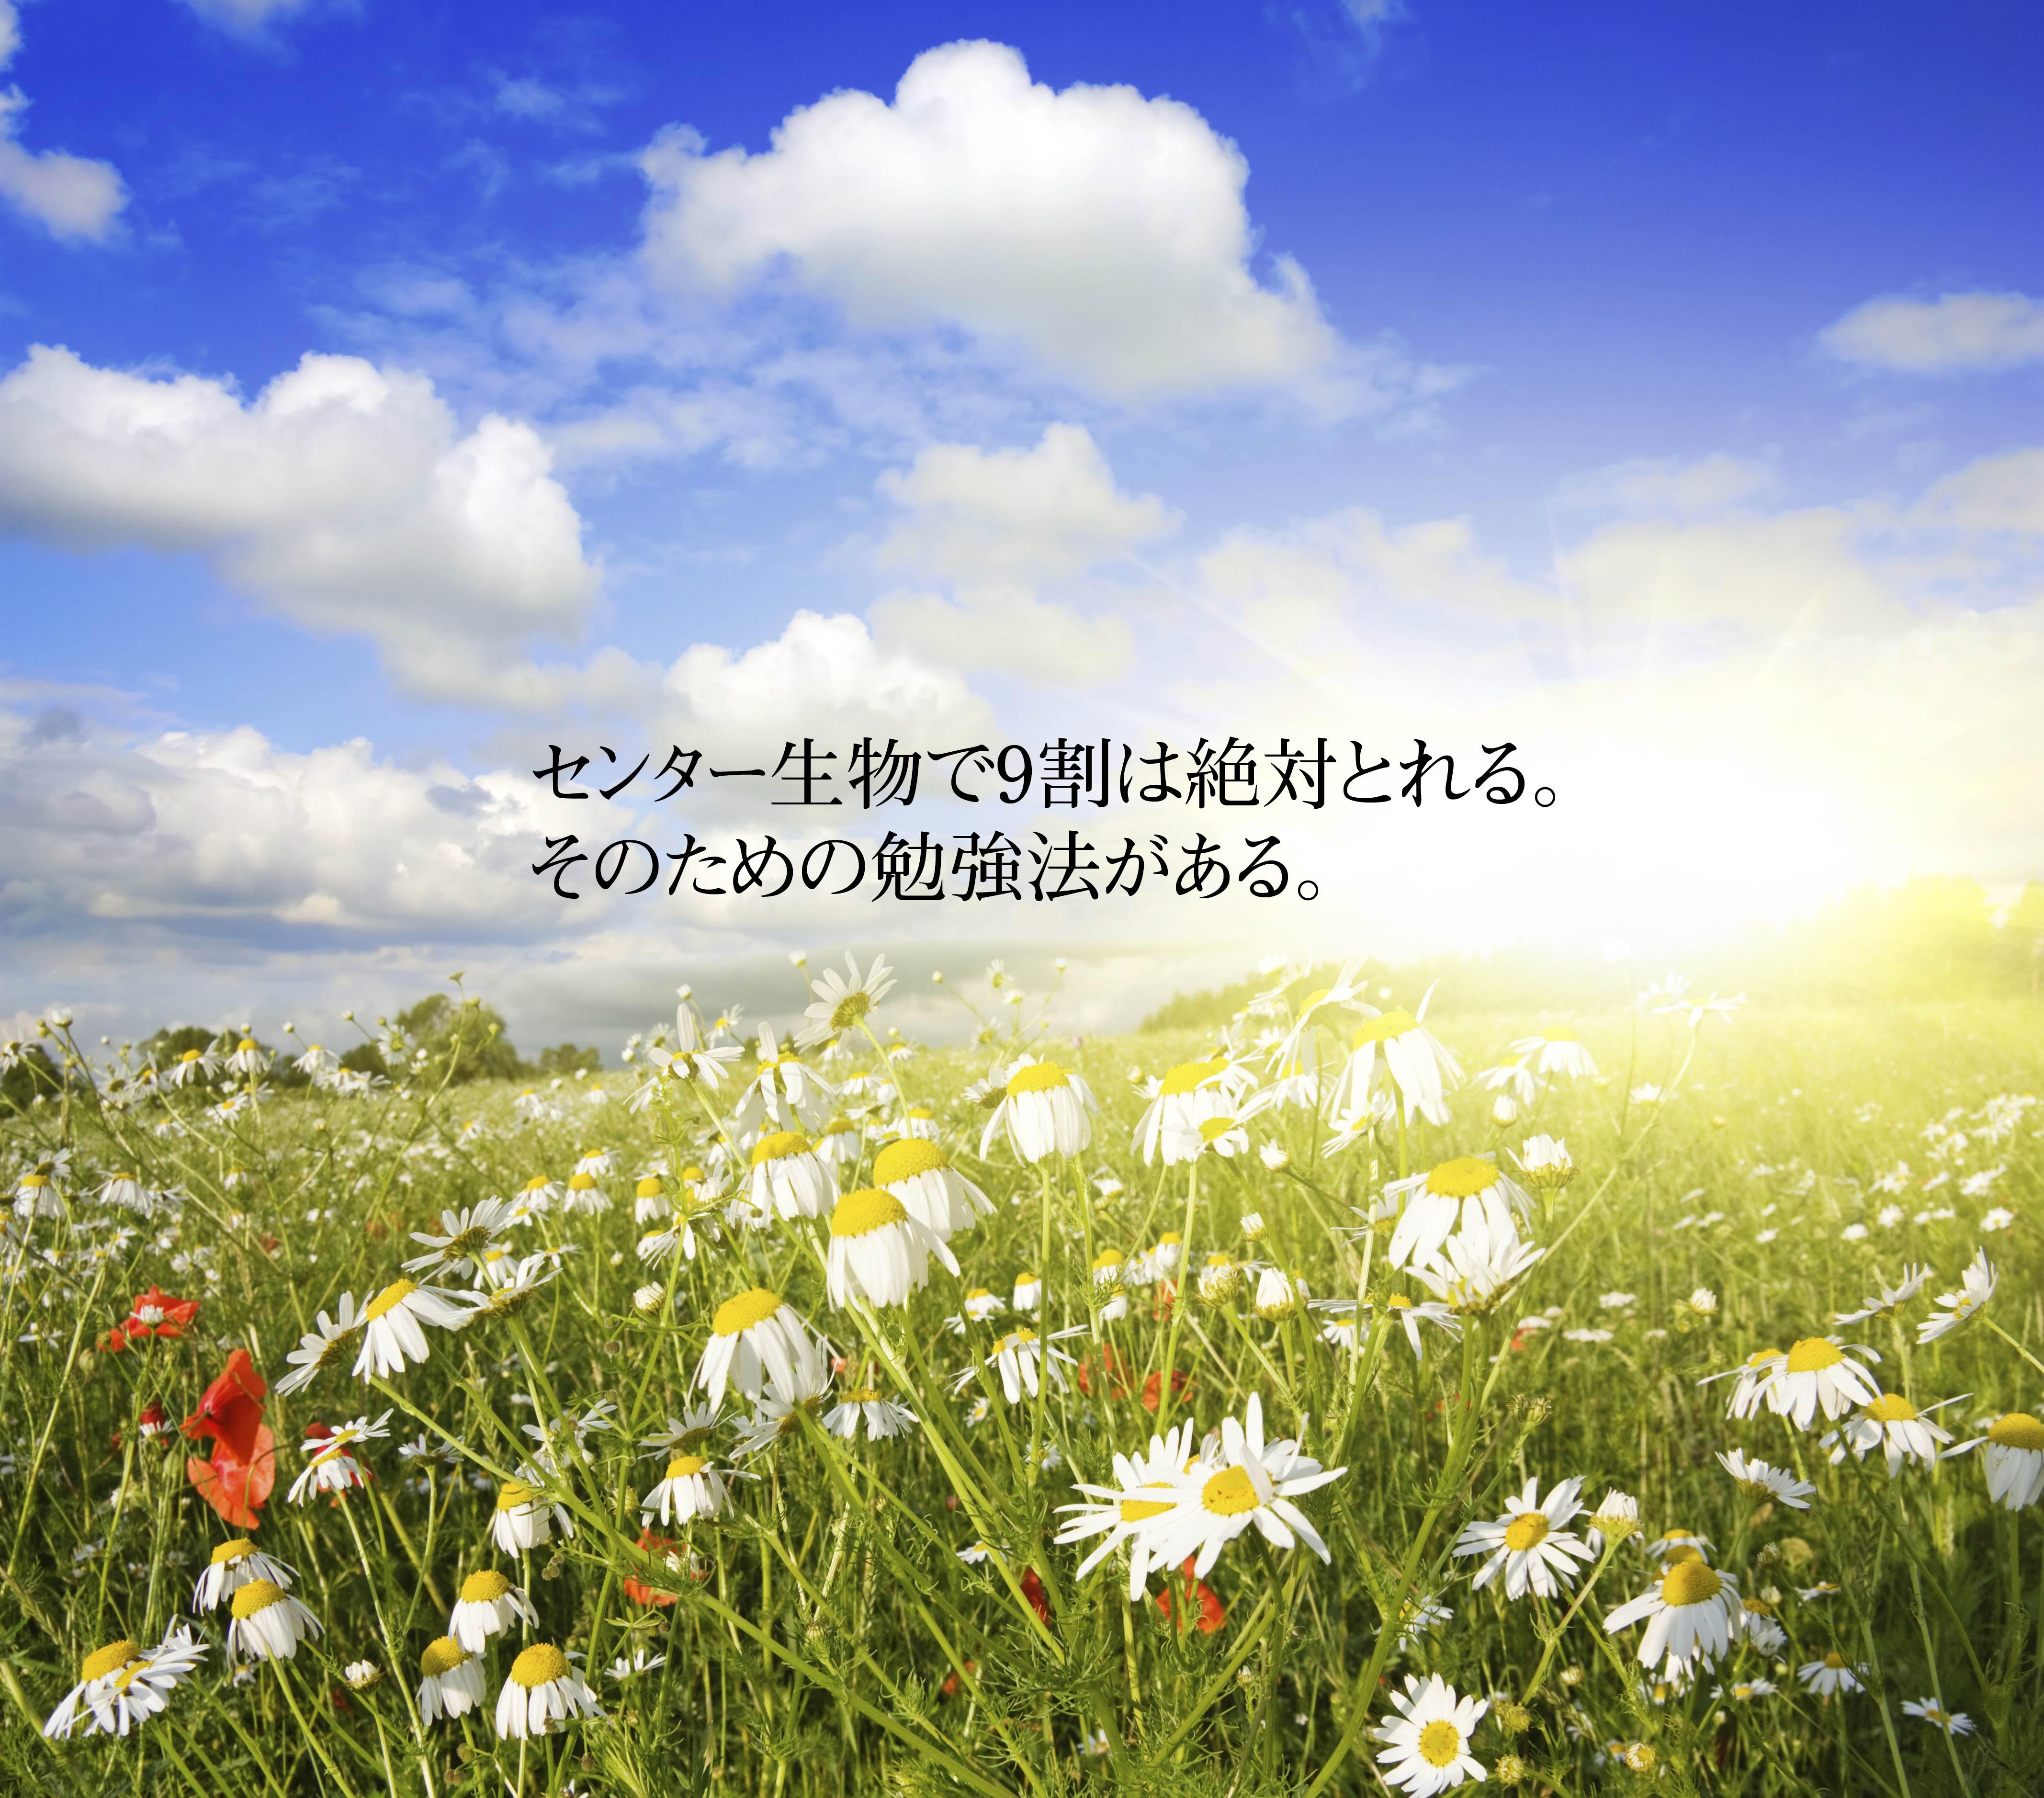 goukaku-lab_2015-08-26_02-13-48.jpg